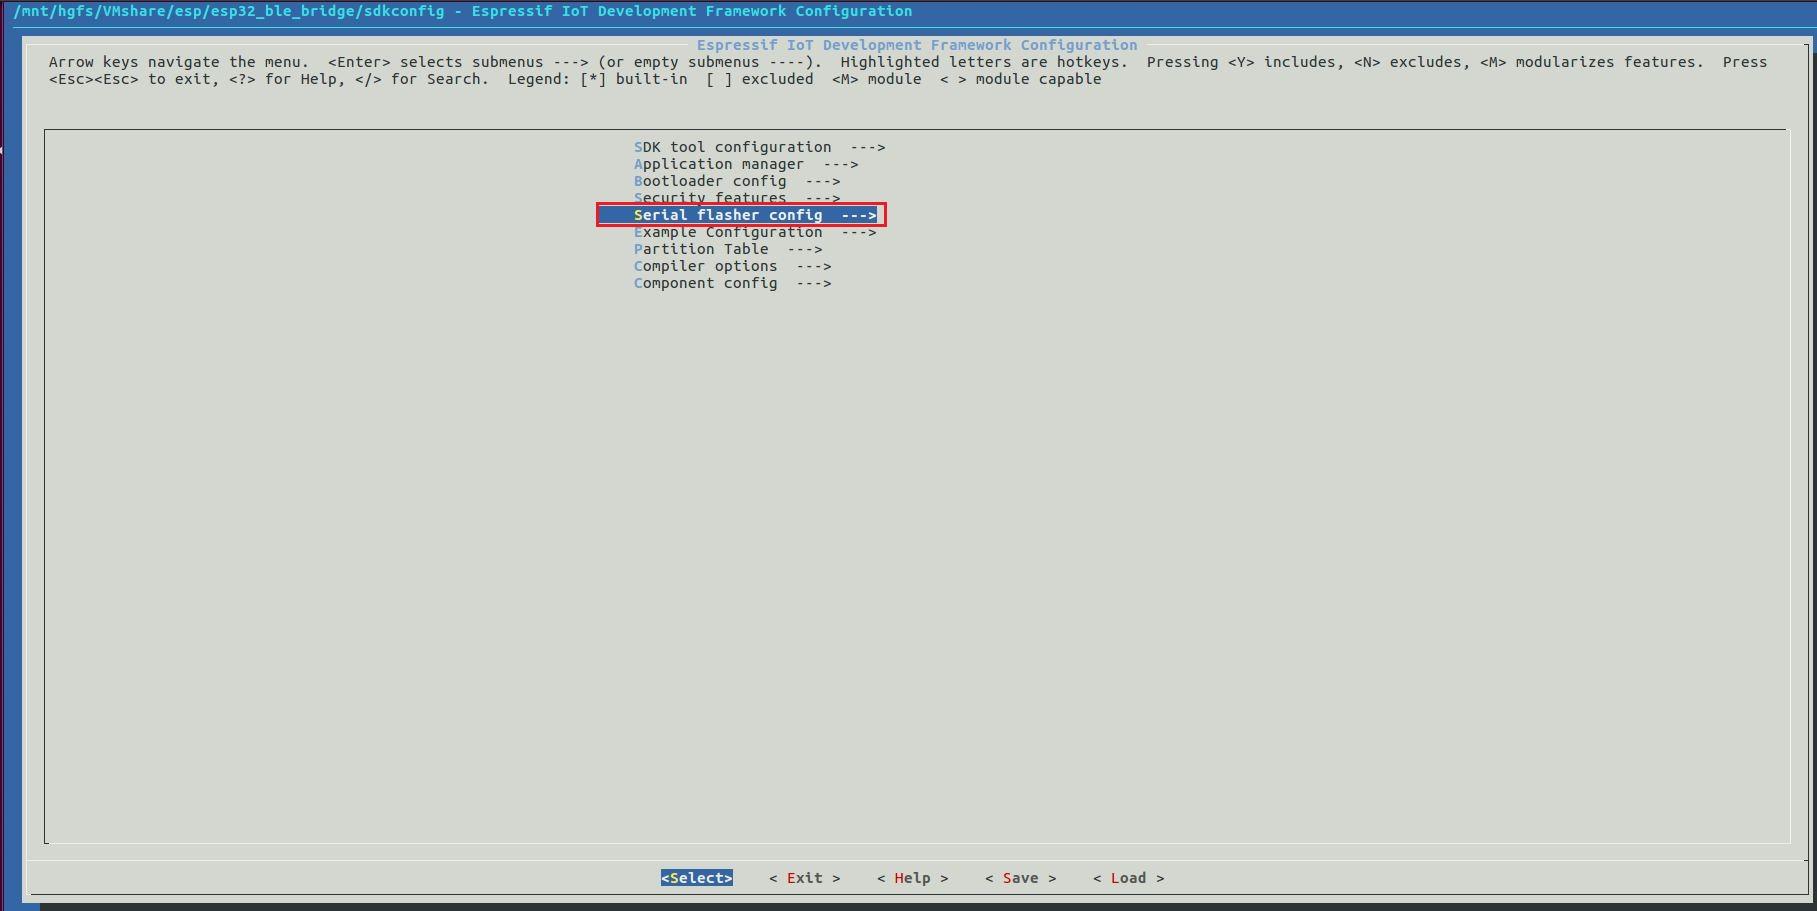 espressif iot development framework configuration